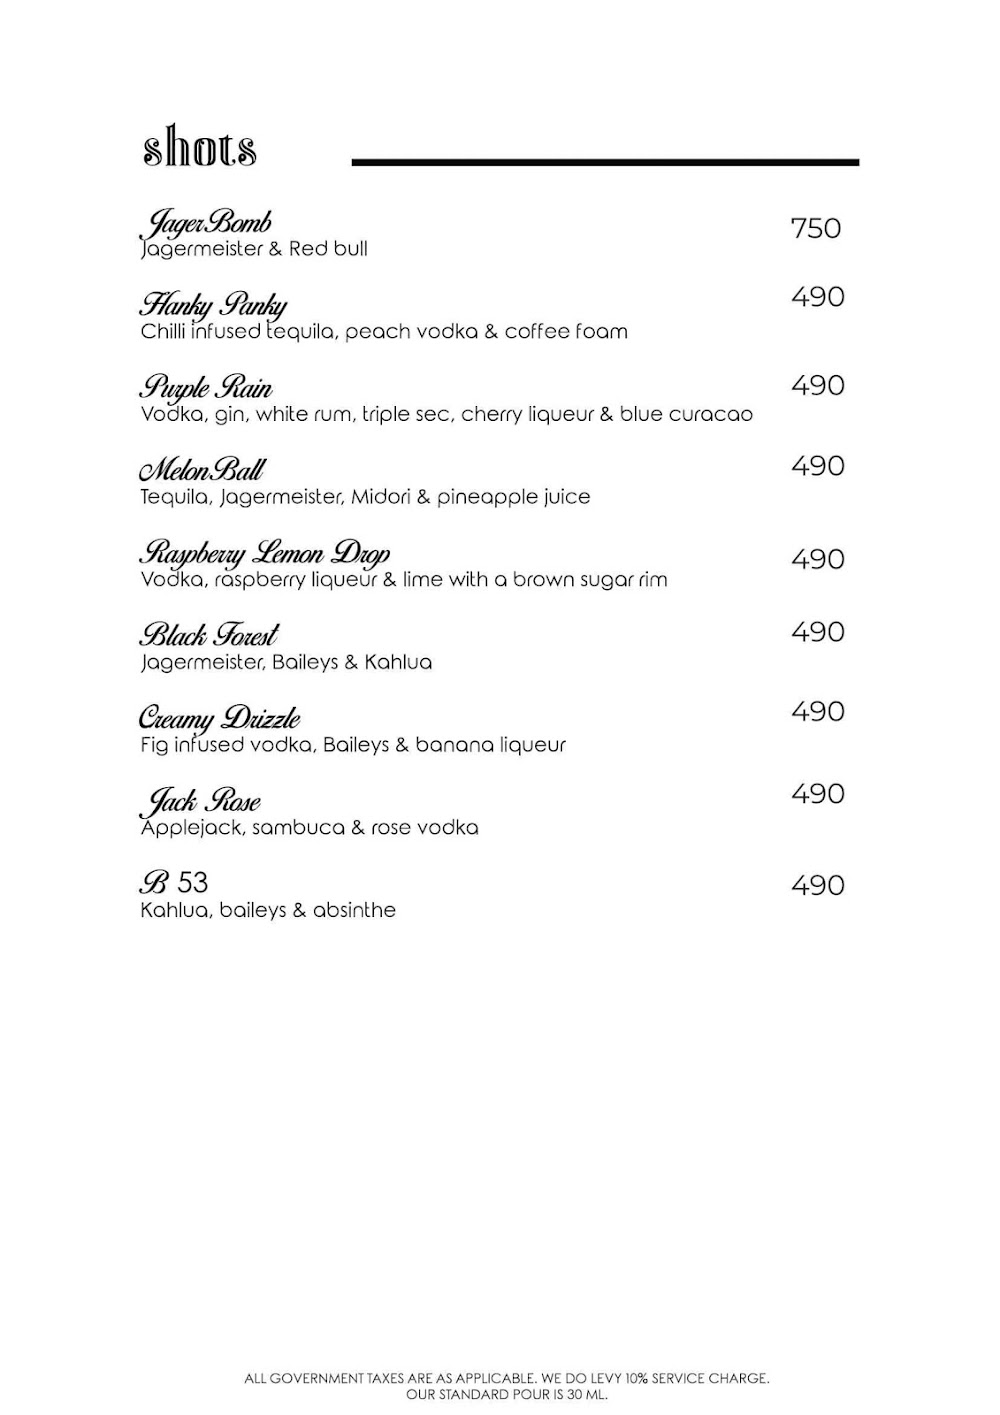 Rocky Star Cafe & Bar menu 15